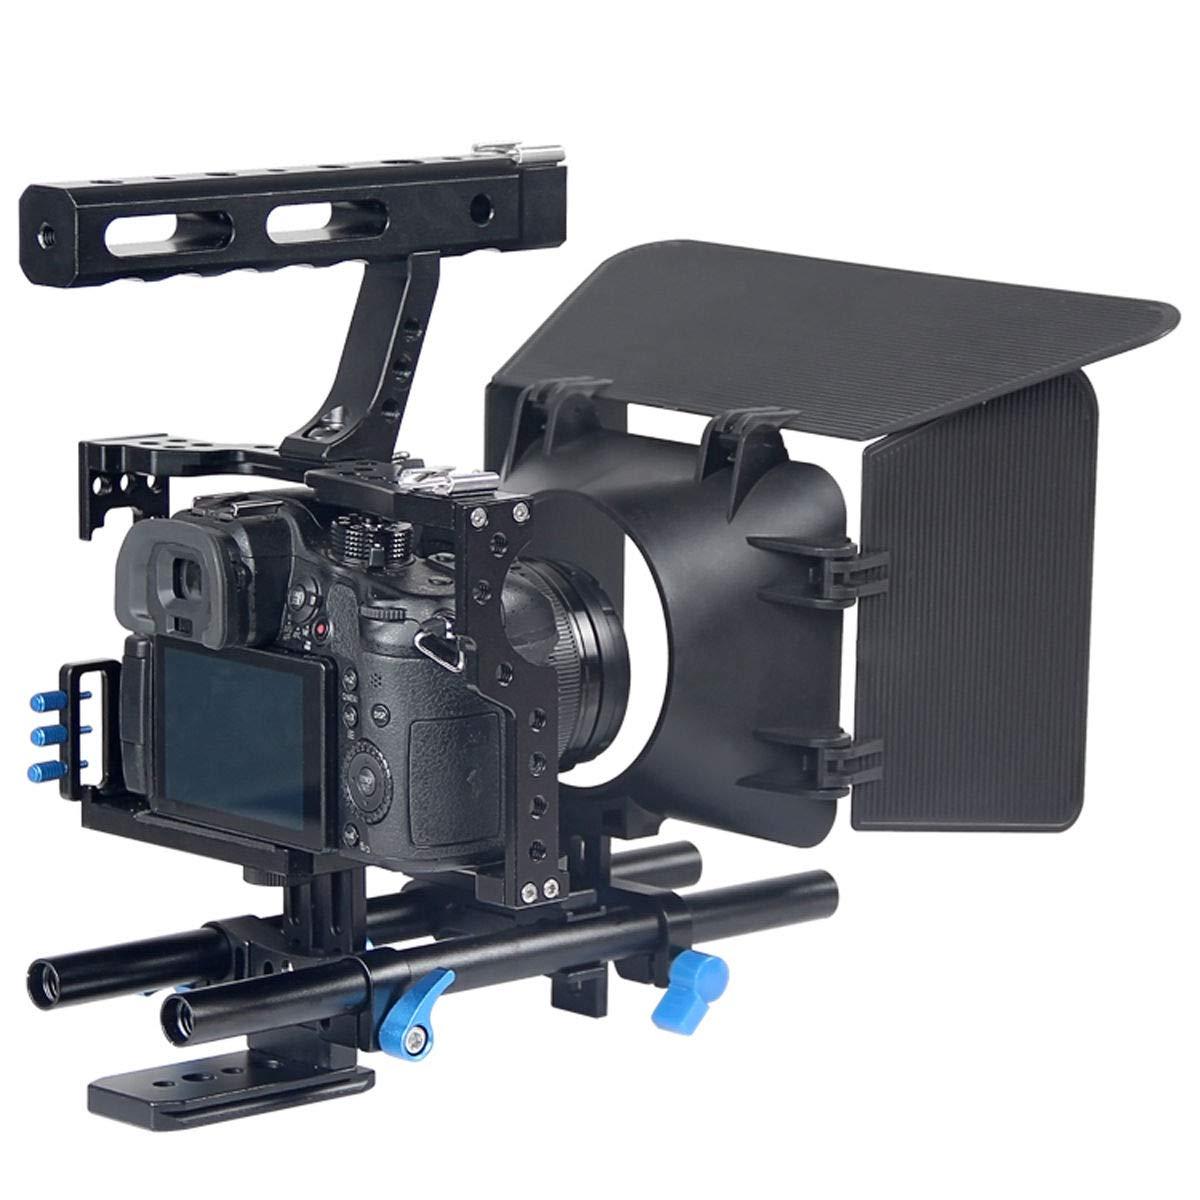 FidgetFidget Stabilizers for DSLR Camera Cage + Follow Focus + Matte Box Kit for Sony A7S A7 A7R A7RII A7SII by FidgetFidget (Image #4)